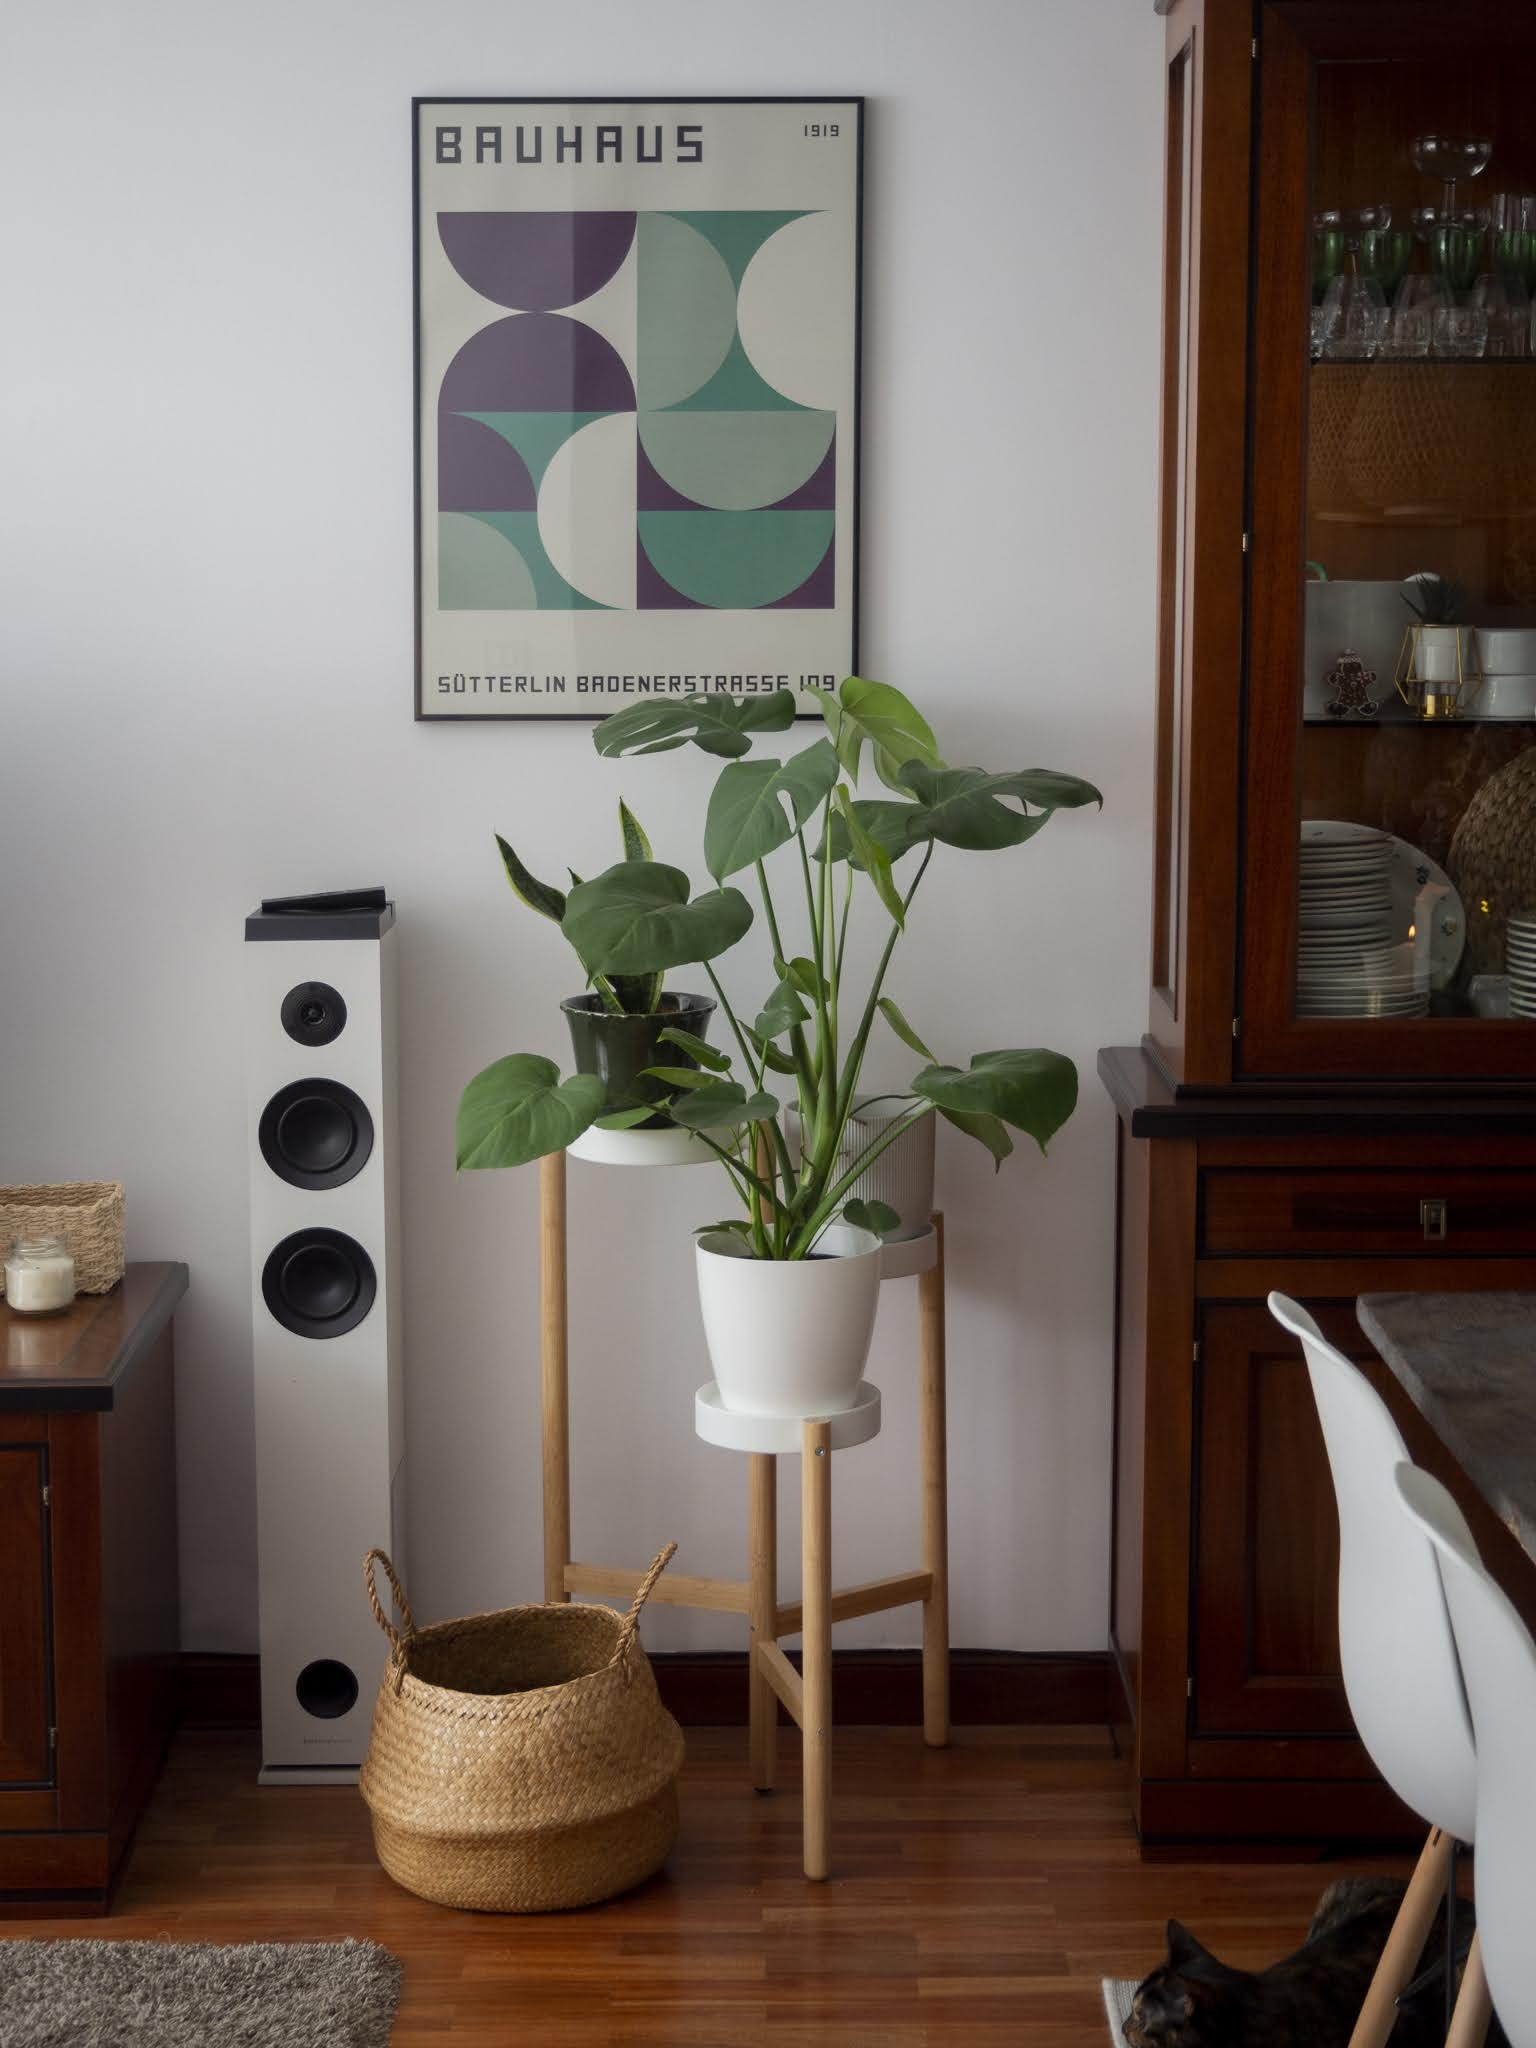 4 trucos para decorar de forma coherente vuestro hogar